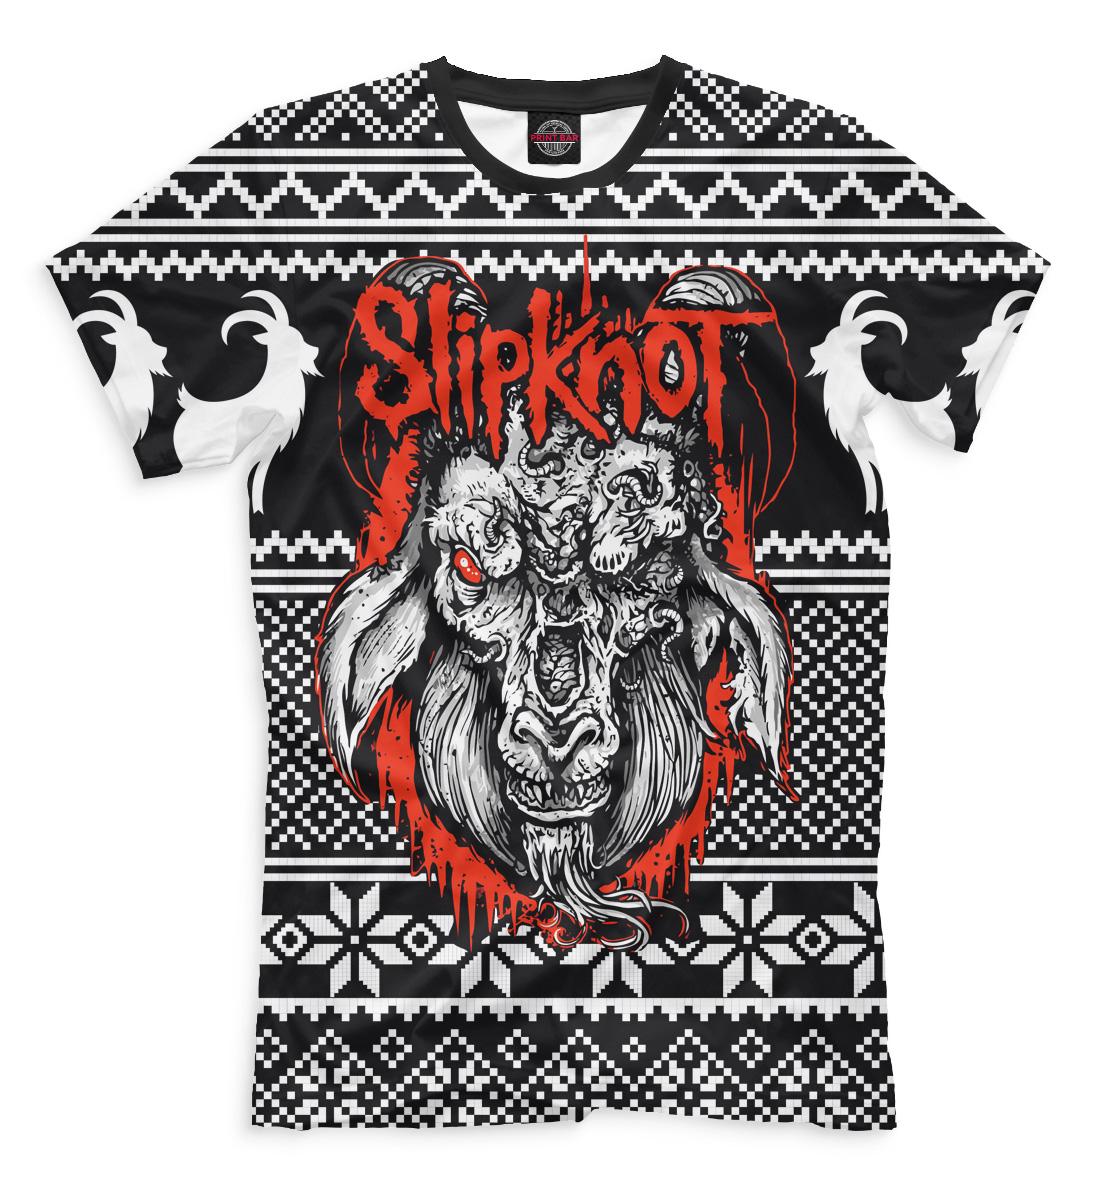 Slipknot, Printbar, Футболки, SLI-546767-fut-2  - купить со скидкой